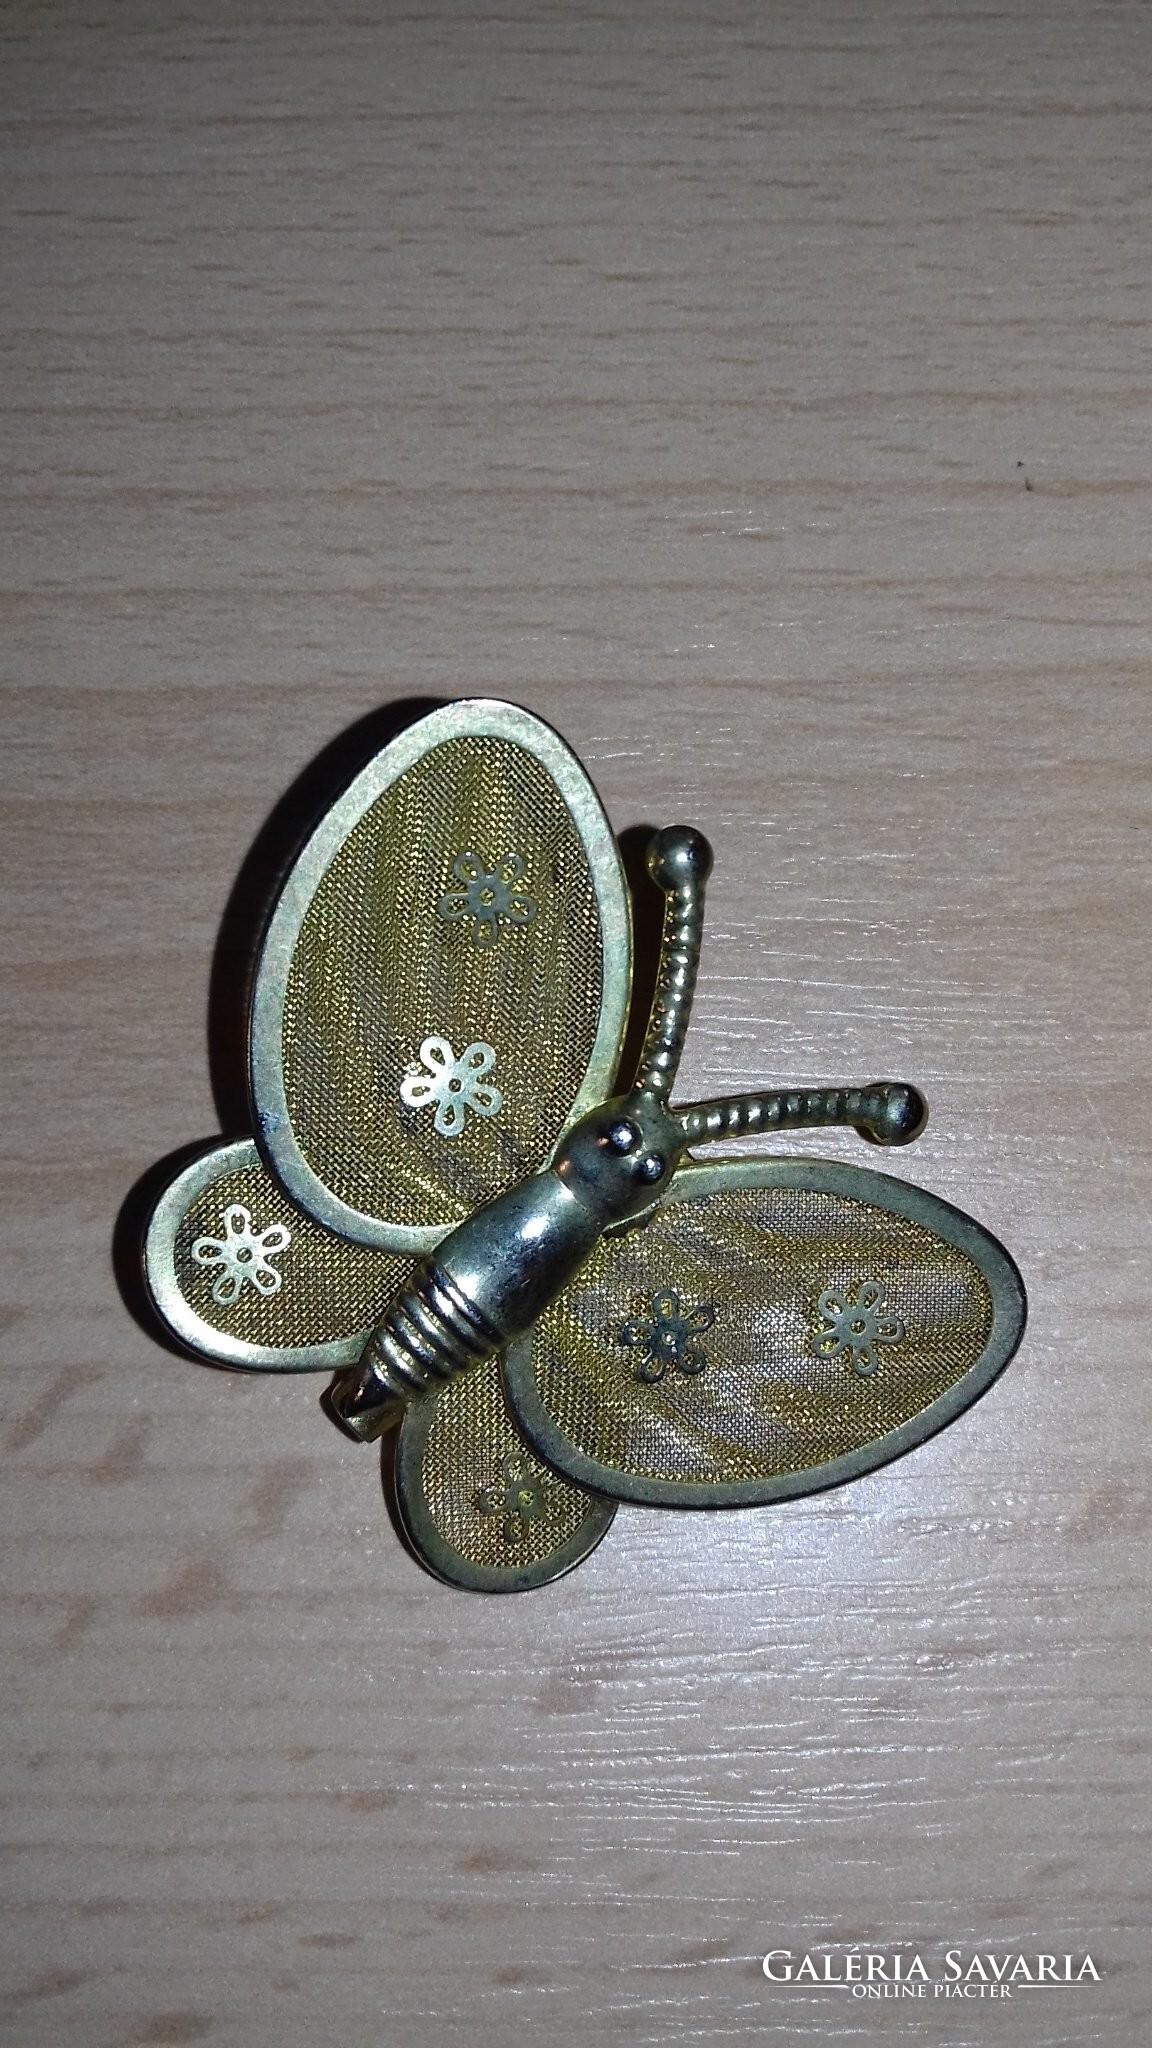 e73a513008 Pillangó alakú fém kitűző, bross 089 - Ékszer | Galéria Savaria ...